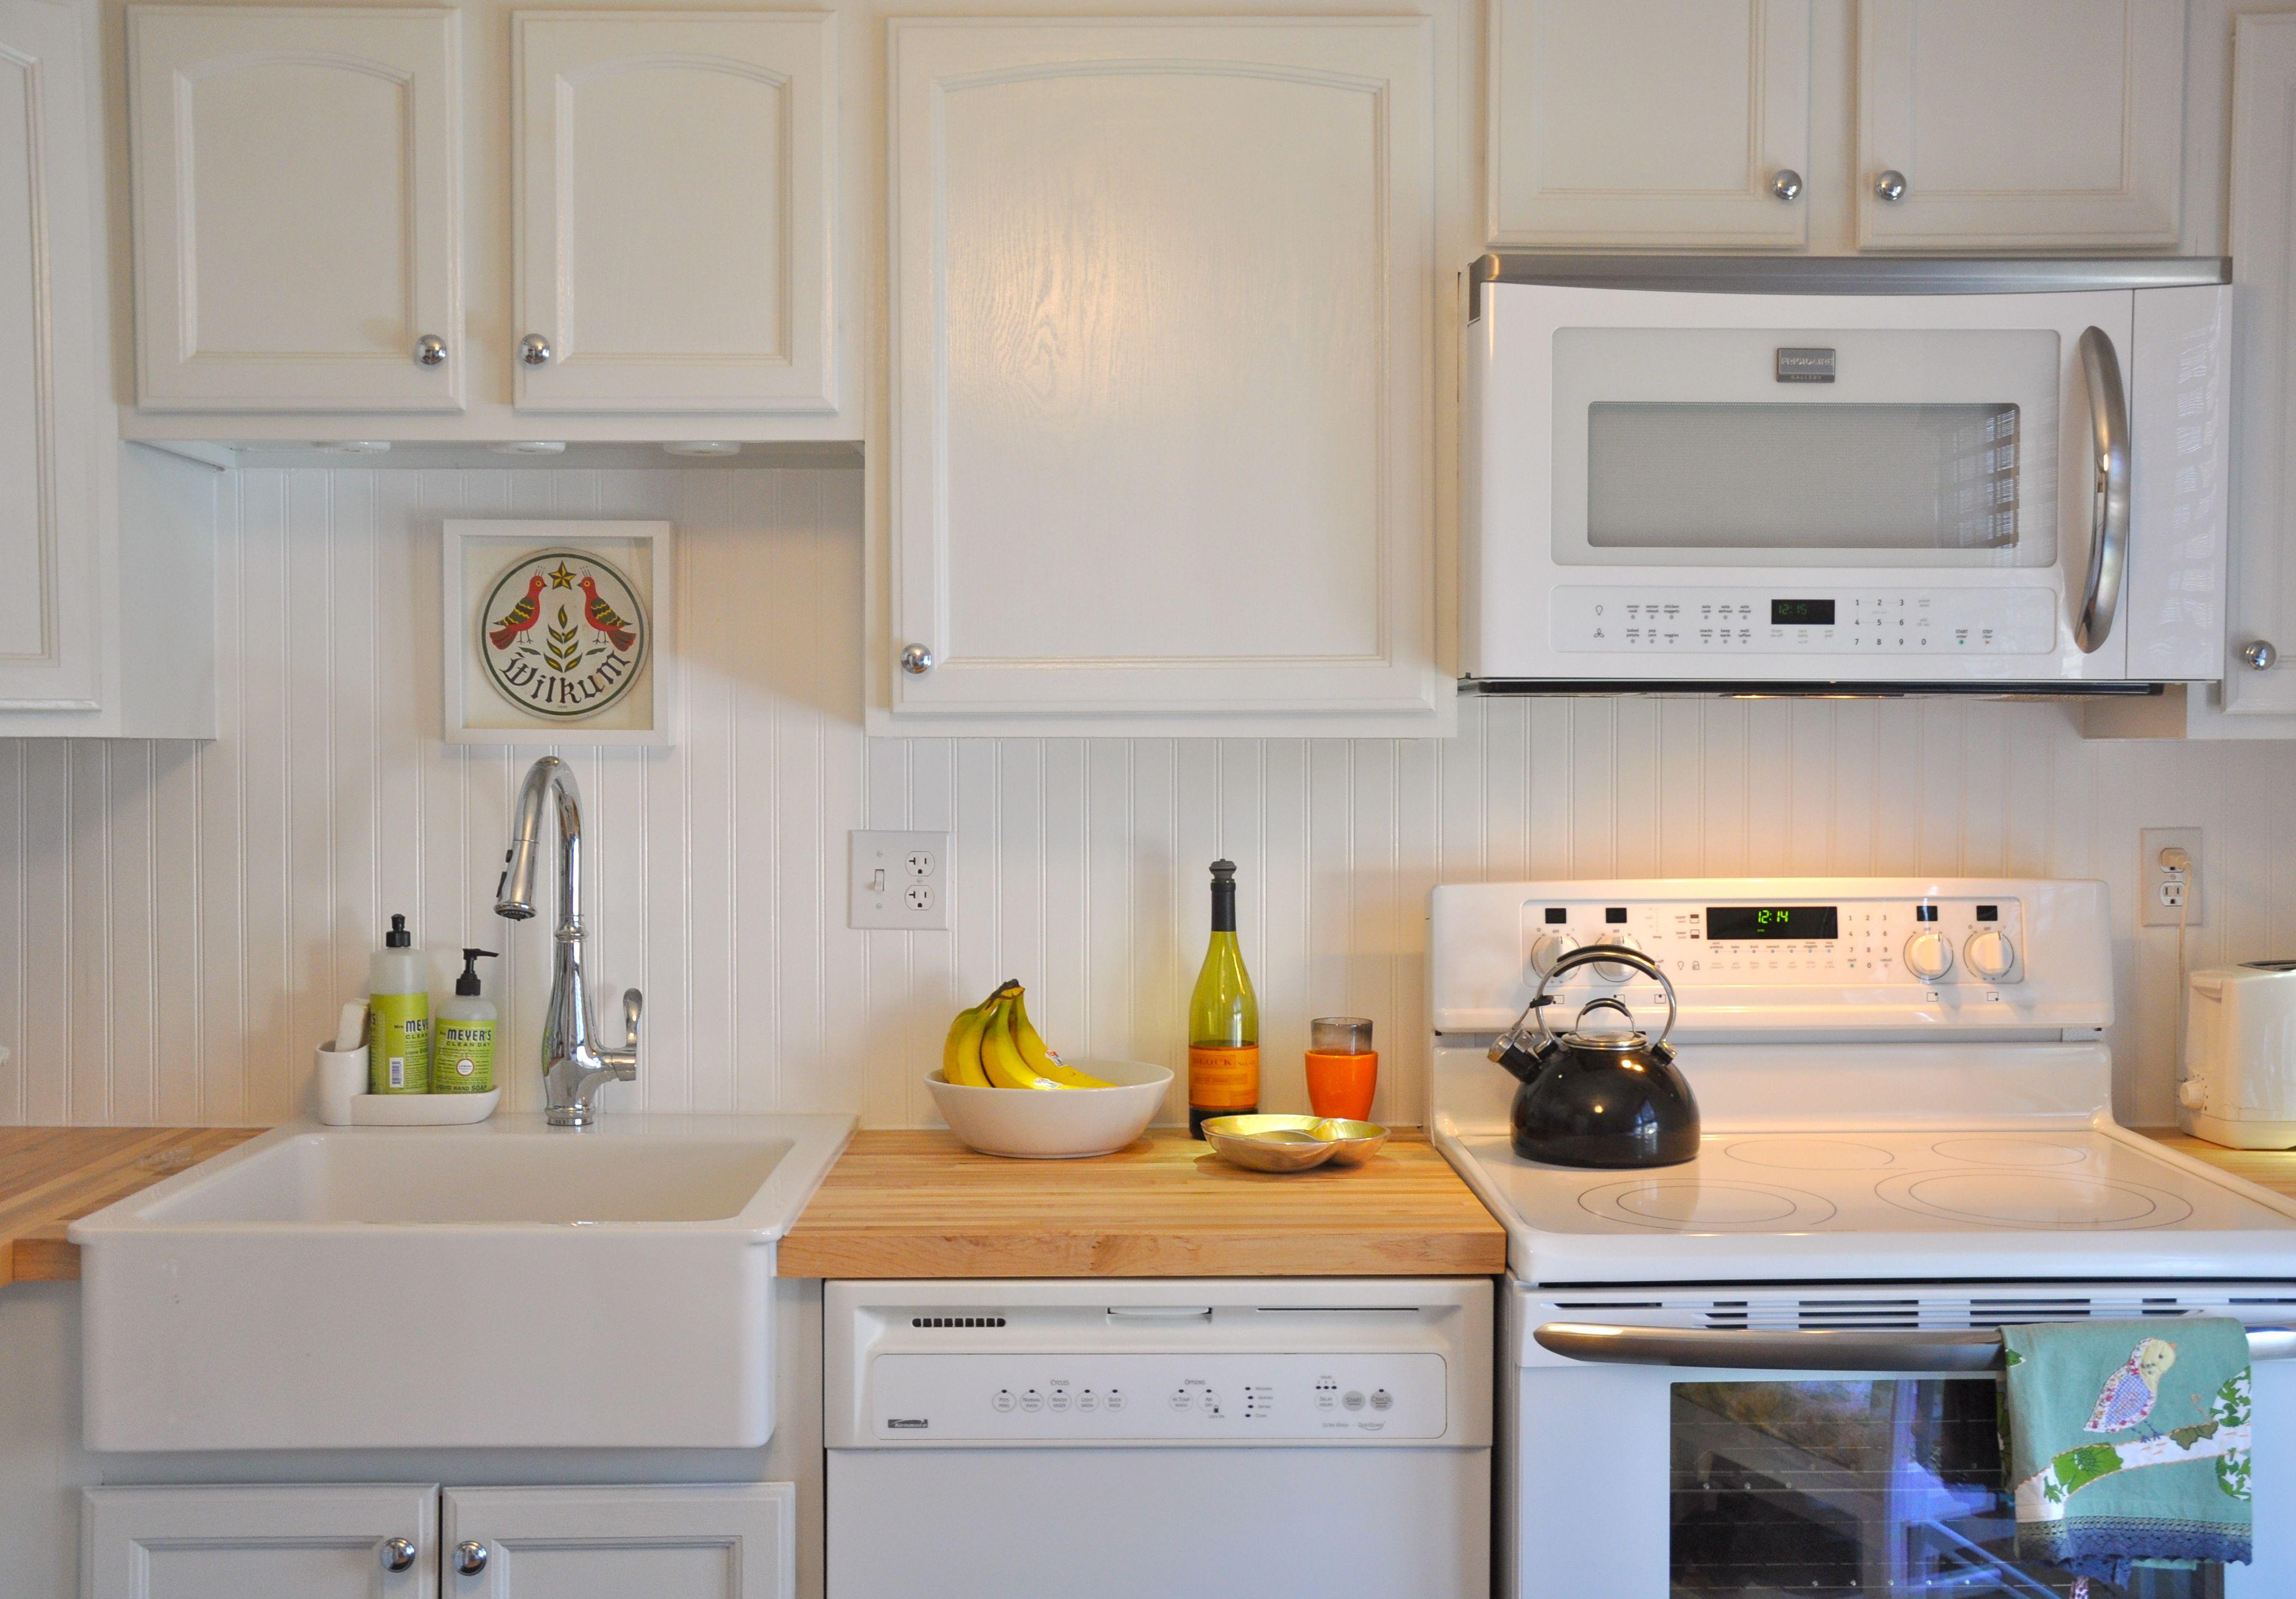 Kitchen Amazing White Beadboard Backsplash Kitchen Tiles With